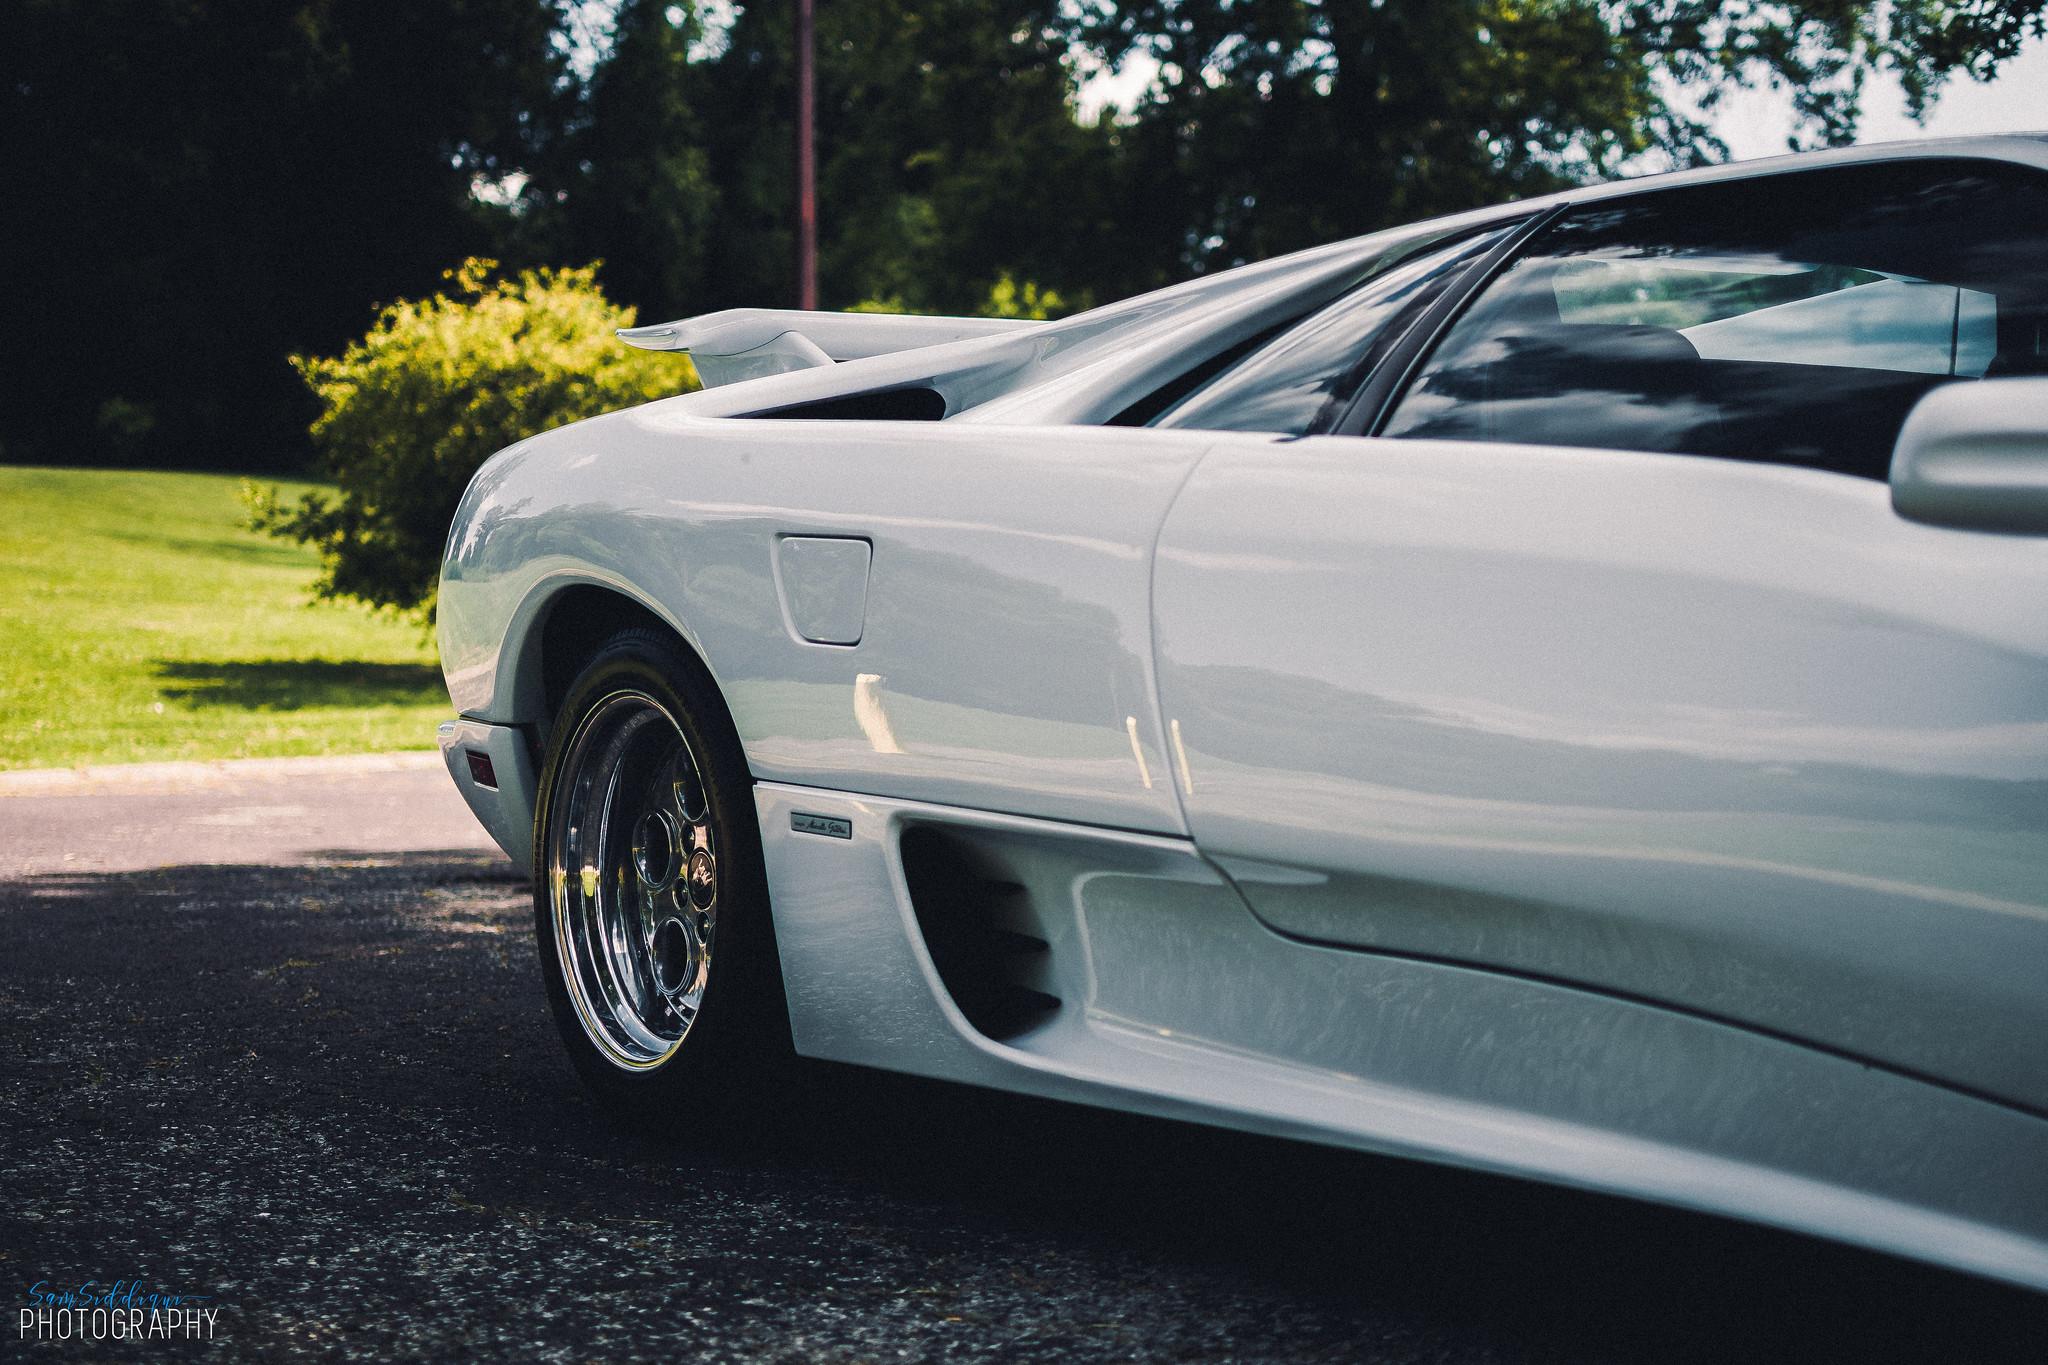 White Lamborghini Diablo